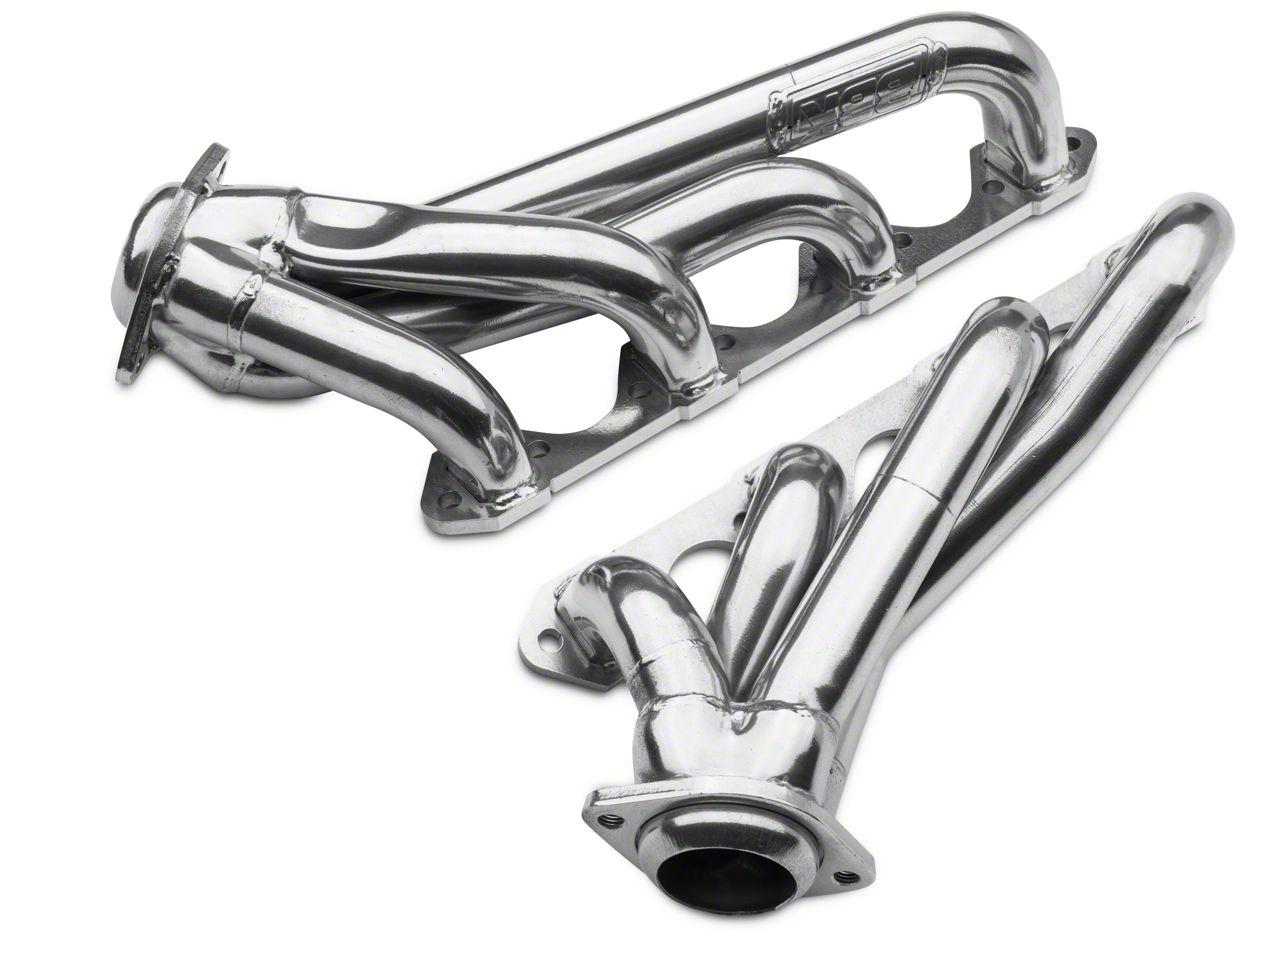 "79-93 Mustang 5.8L V8 BBK 351 Swap 1-5//8"" Chrome Unequal Length Shorty Headers"